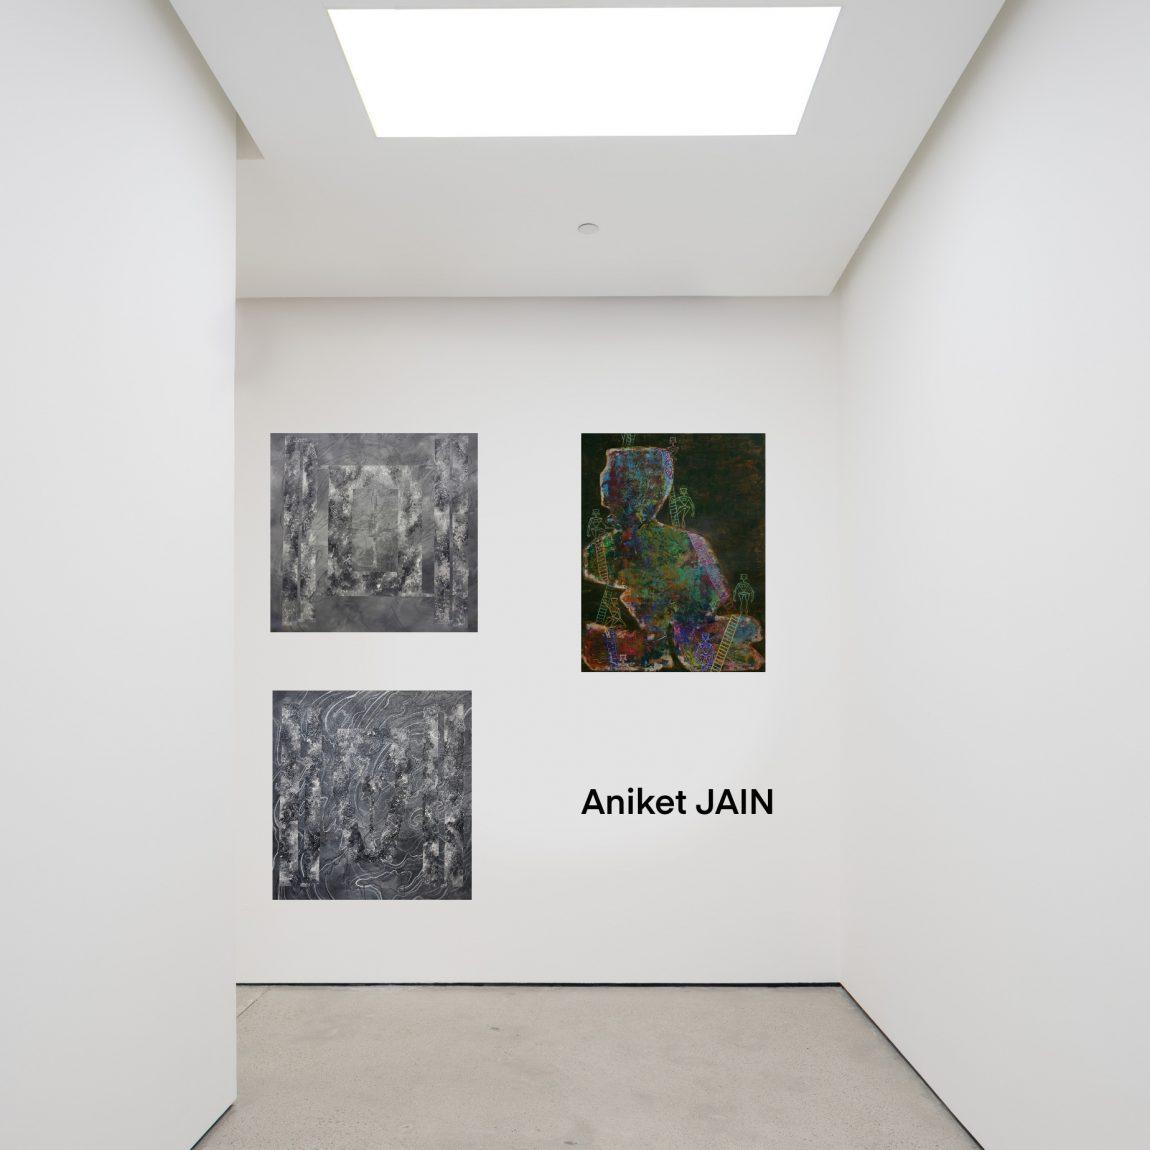 Aniket Jain